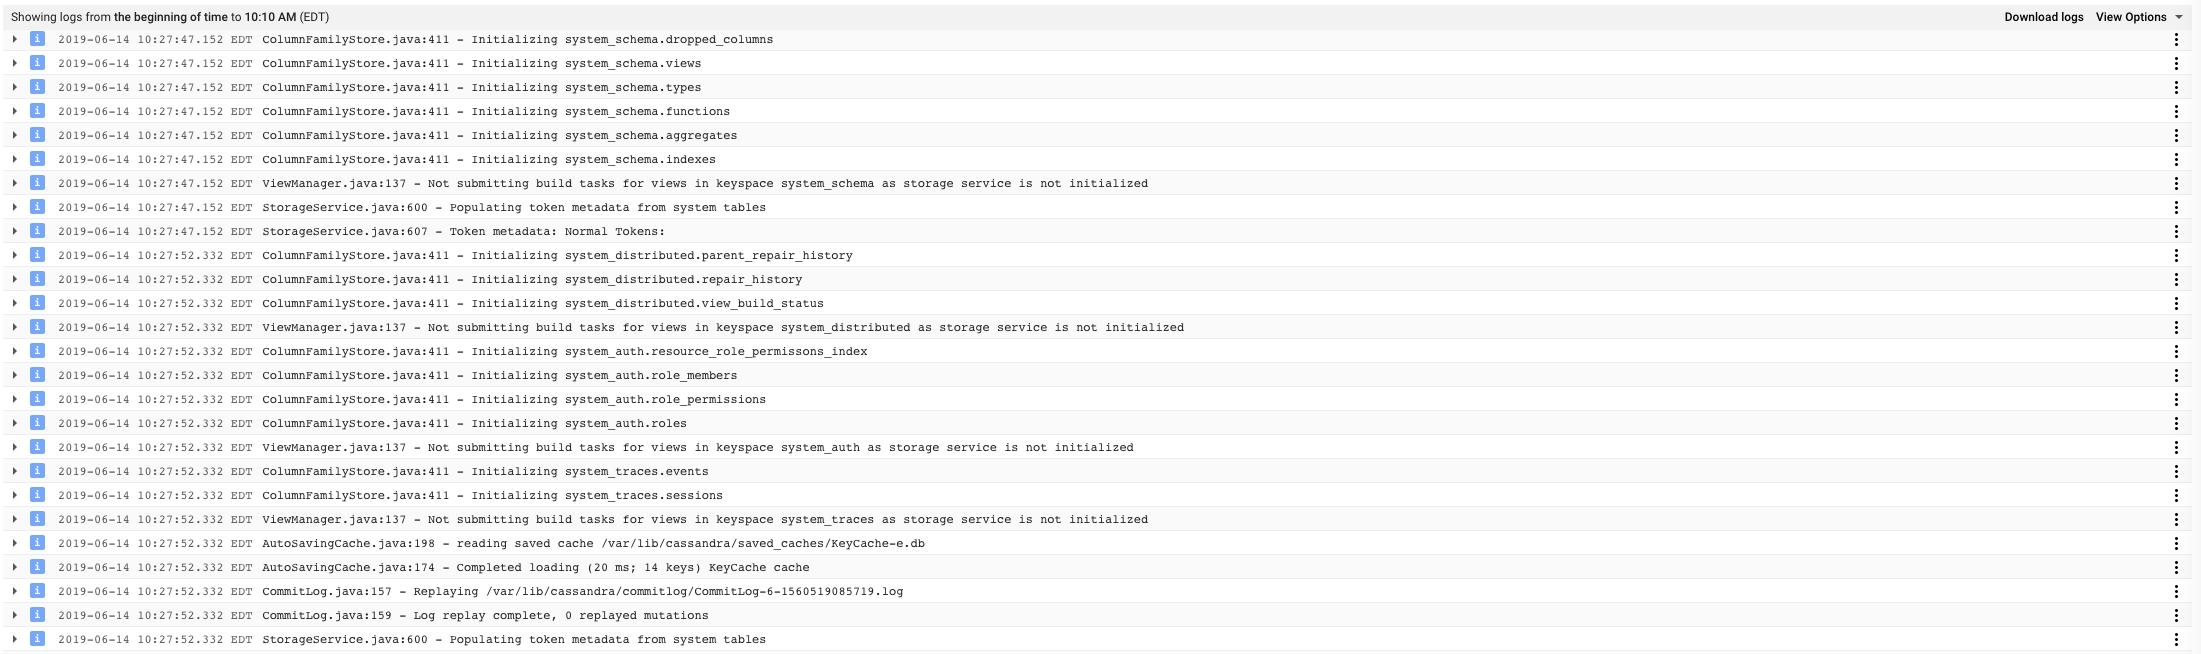 Apache Cassandra Startup Logs Example